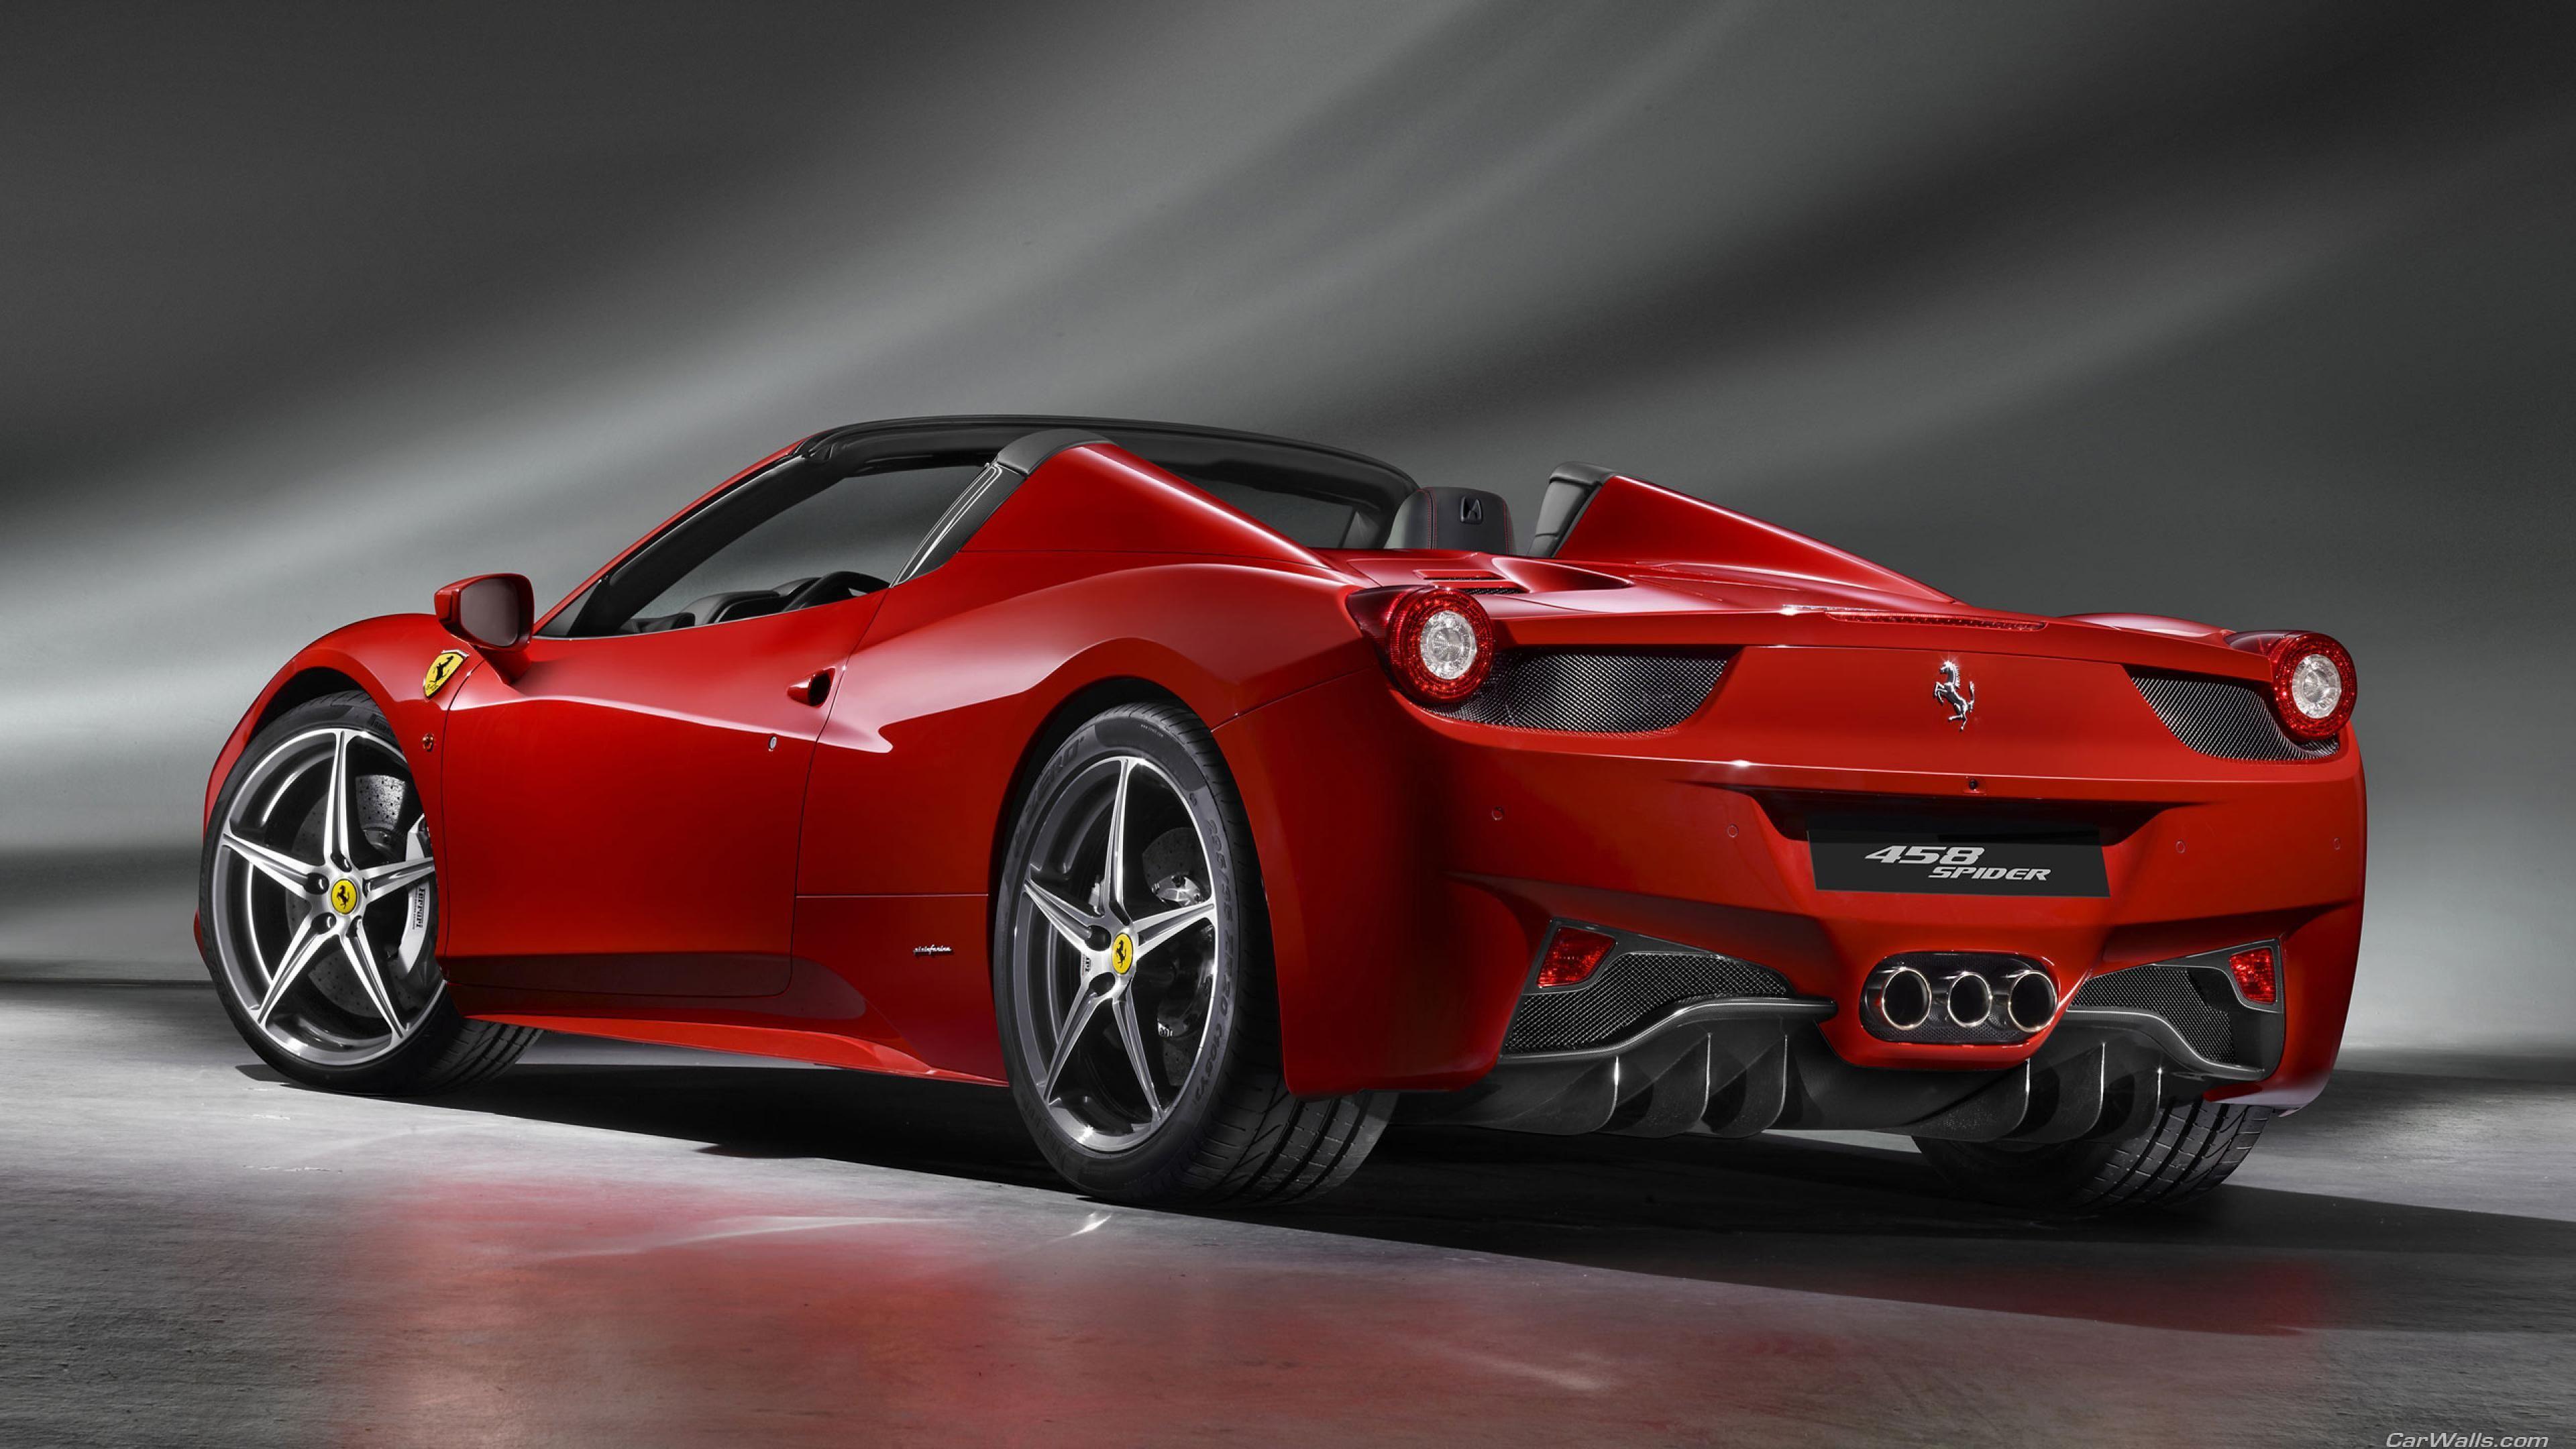 21707c7cb19a3730f8df4b3ae59538d7 Fabulous Ferrari Mondial 8 Super Elite Cars Trend